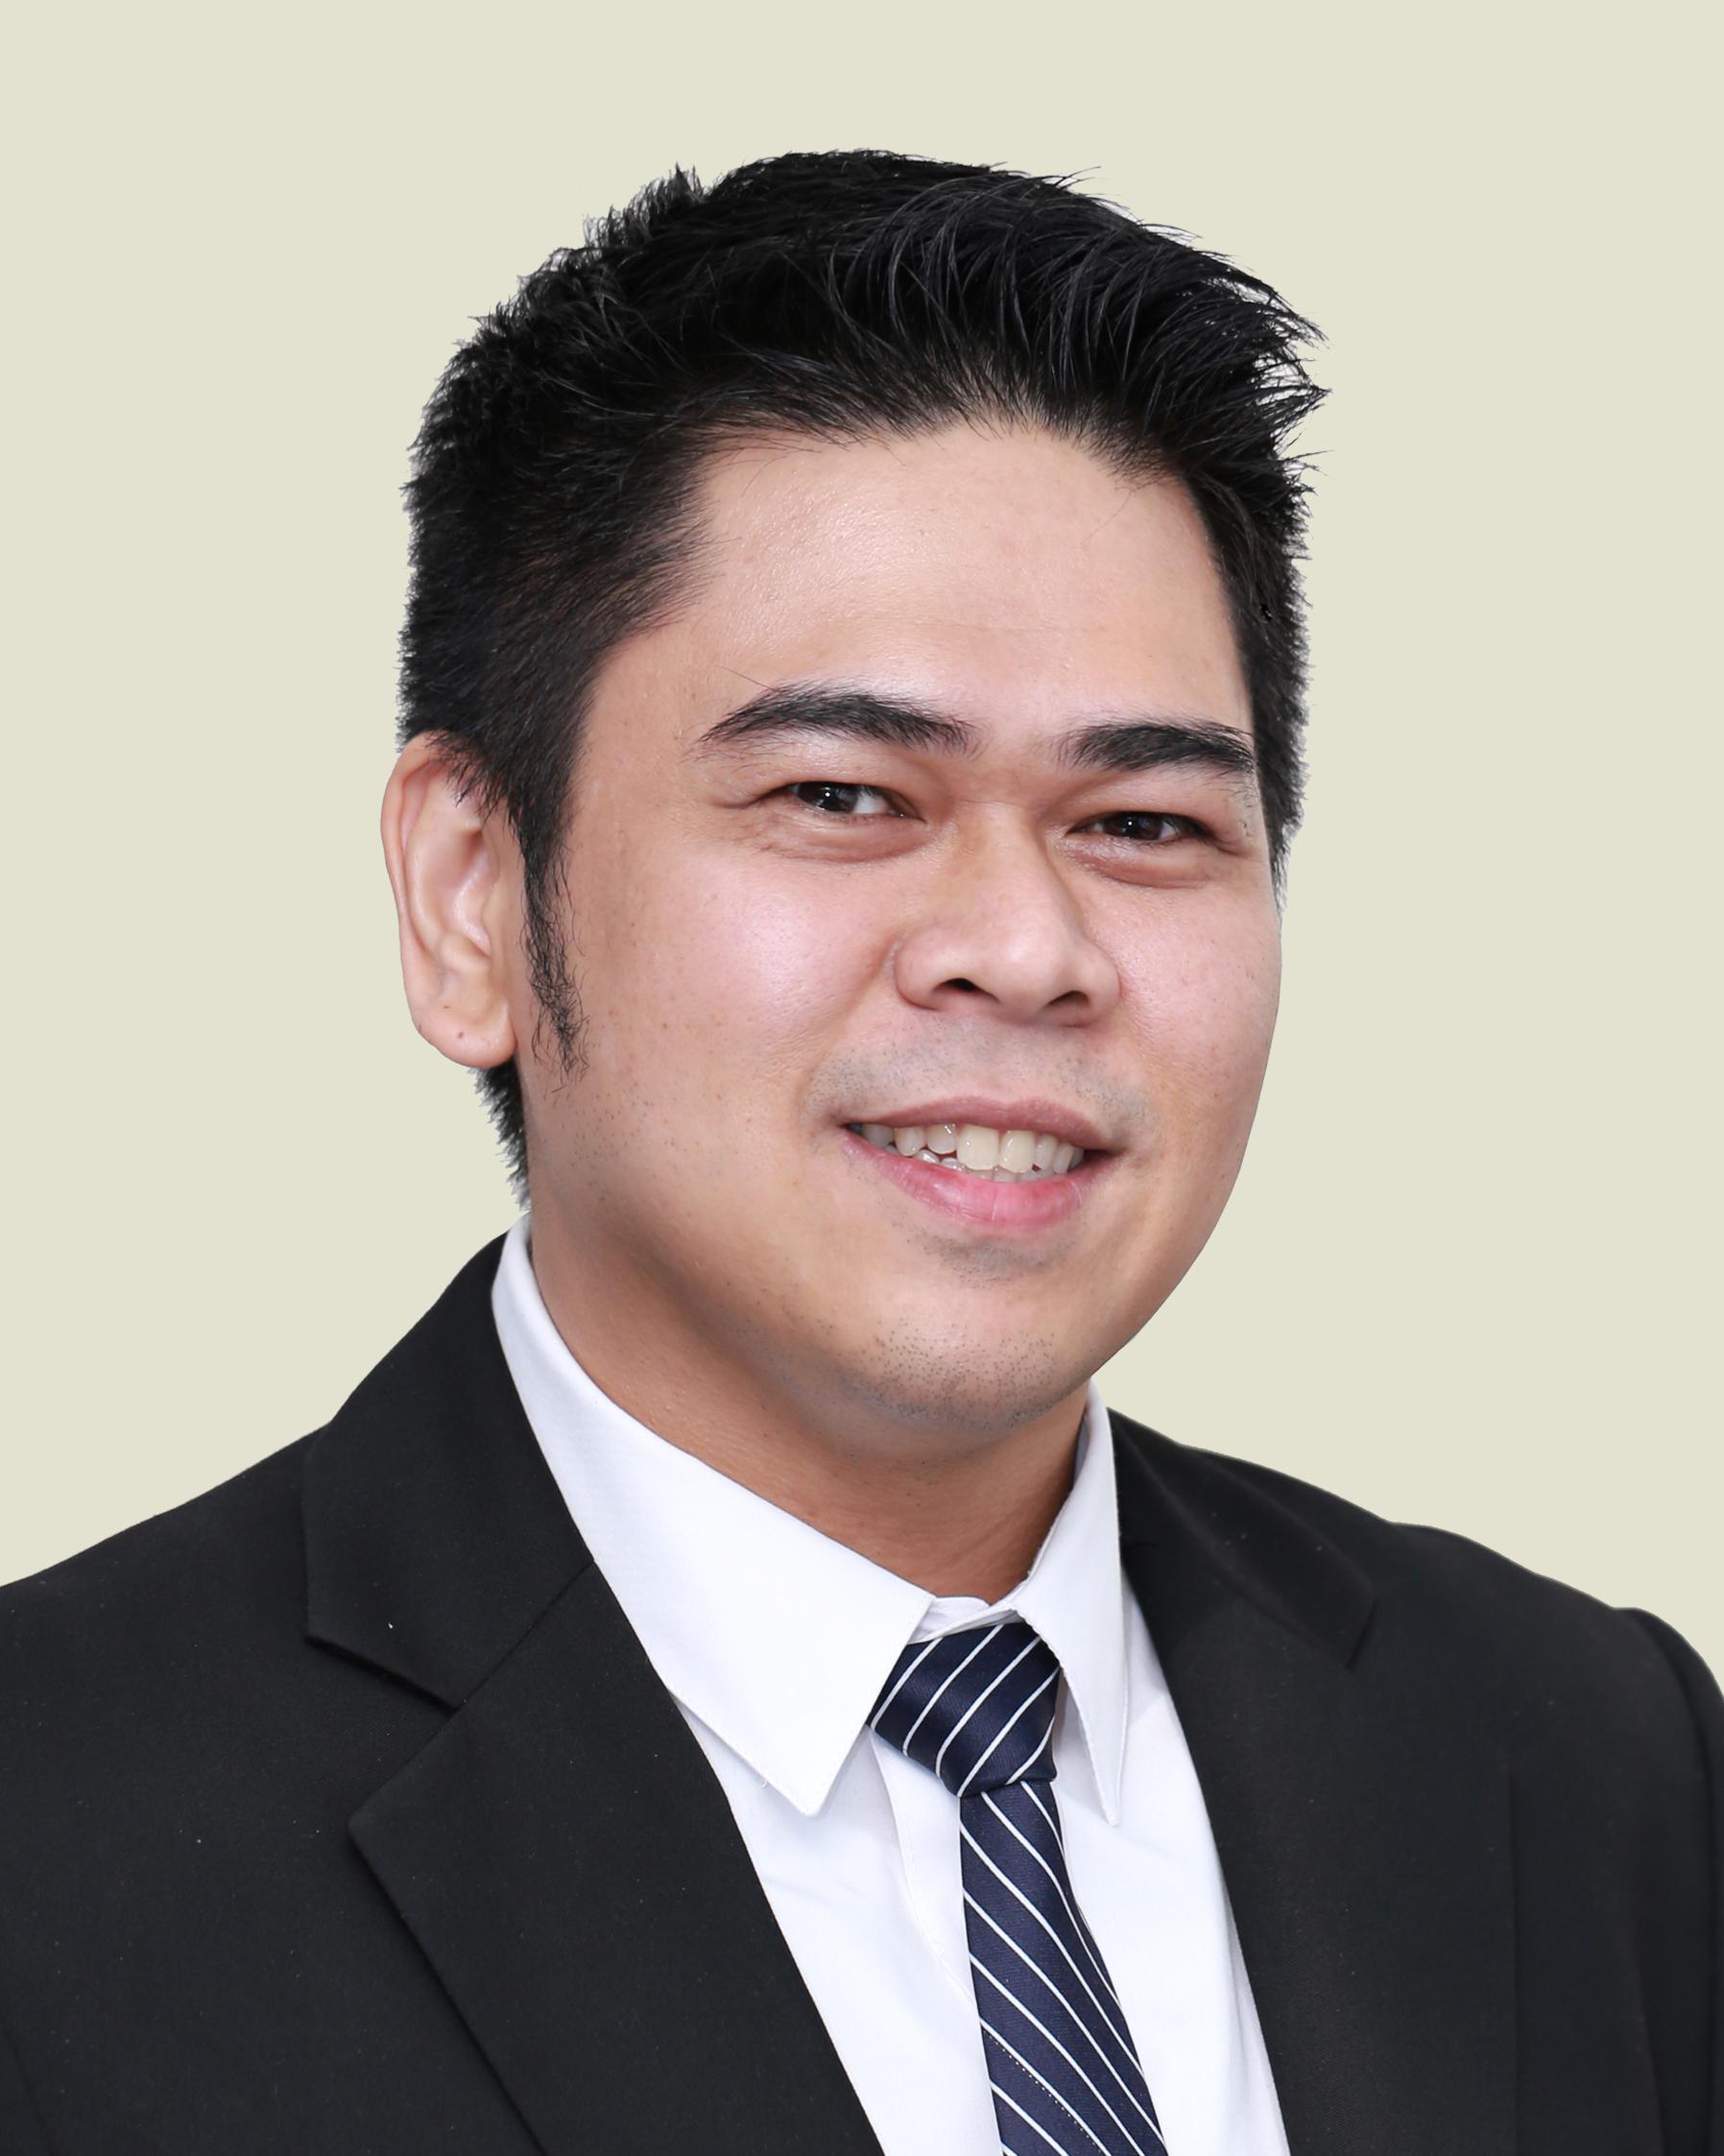 Mark Balajadia